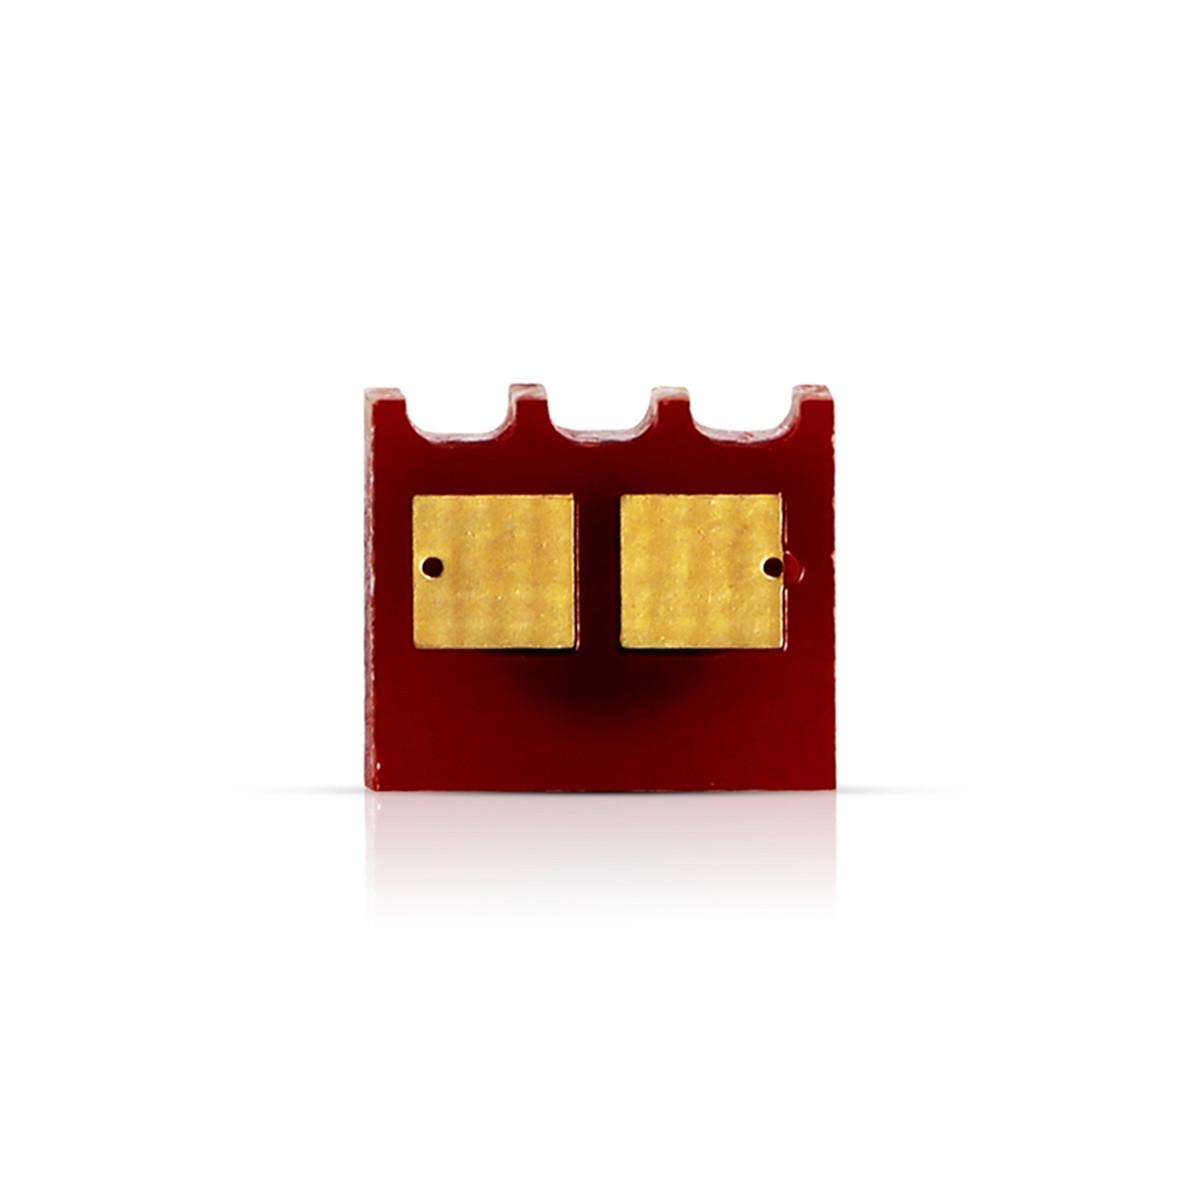 Chip HP P1005 P1505 M1120 M1132 P1102 | 85A 36A 35A | Universal HP | 1.500 impressões